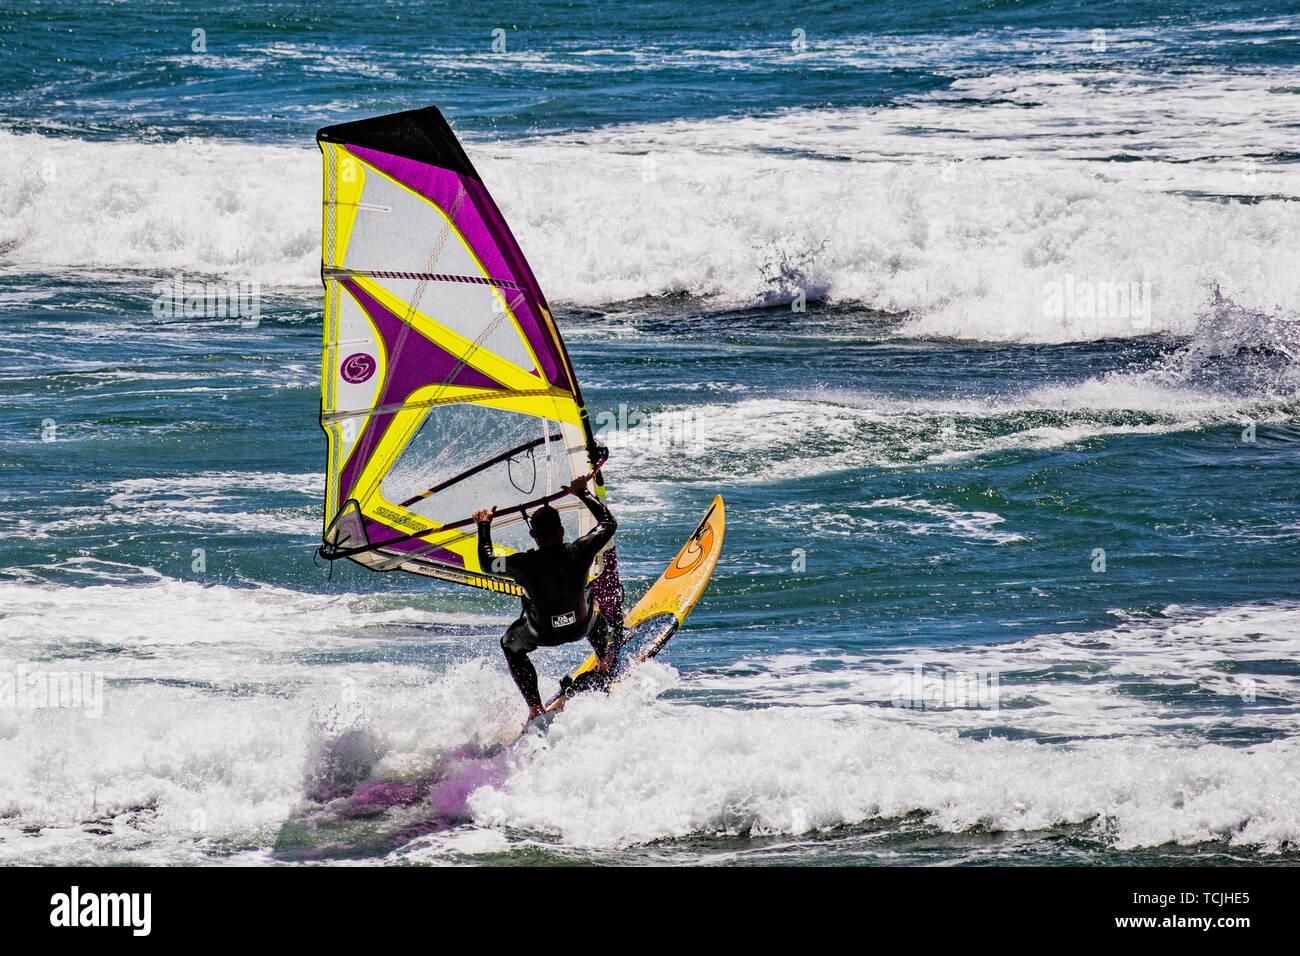 June 6, 2019 Davenport / CA / USA - Man windsurfing in the Pacific Ocean, near Santa Cruz, on a sunny and warm day - Stock Image